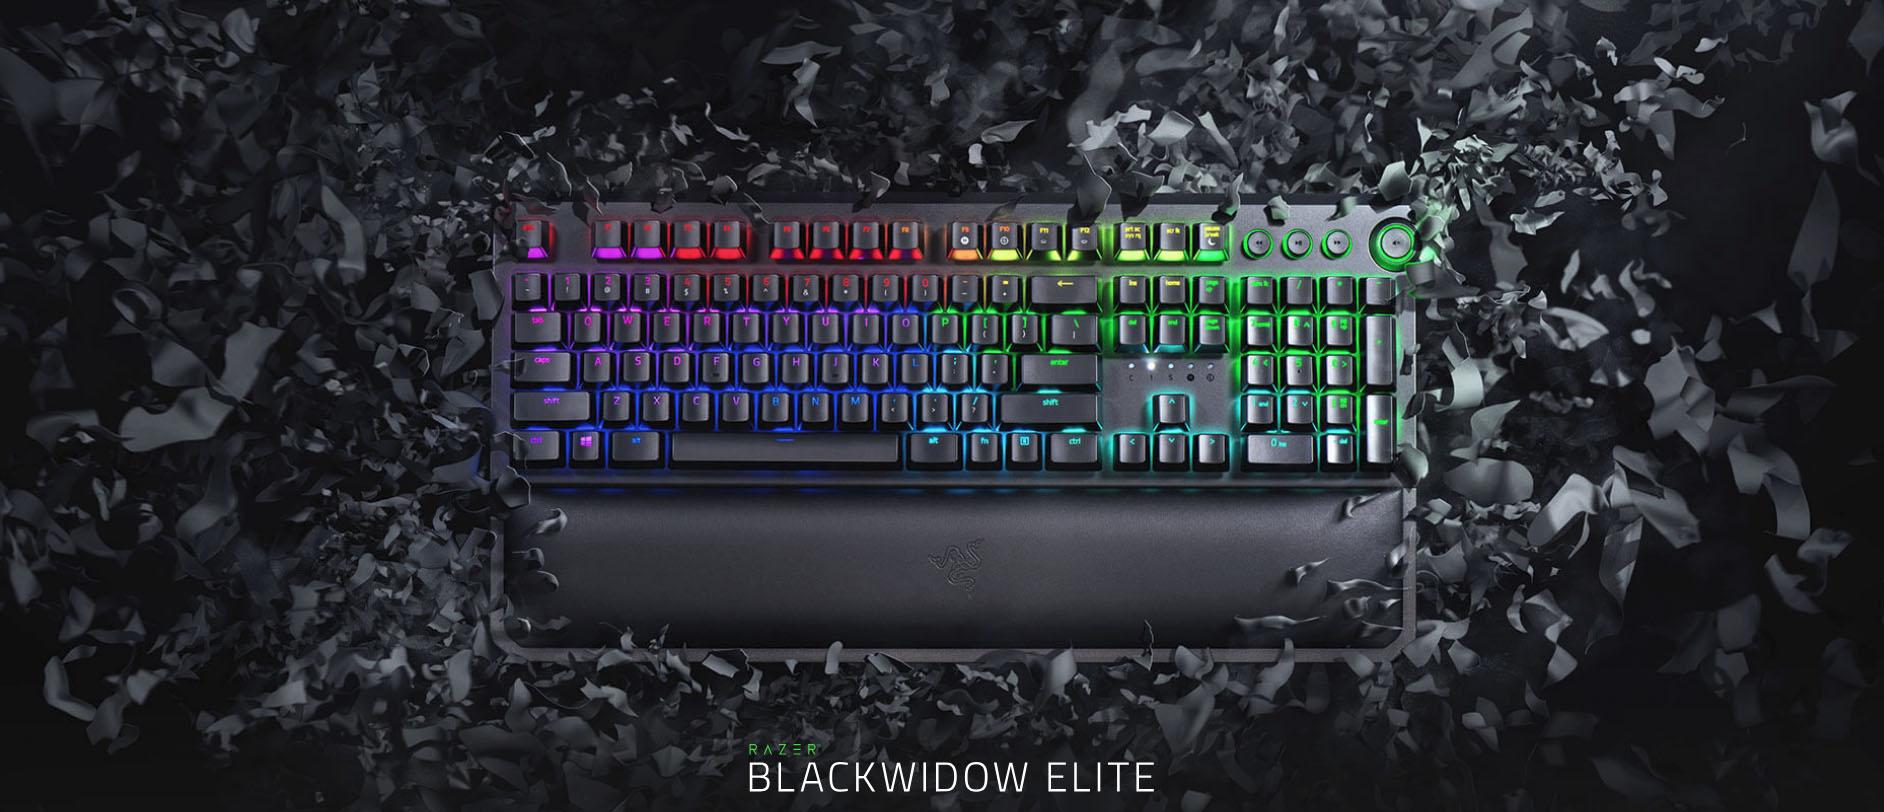 Razer Blackwidow Elite with Multi-Function Digital Dial / Macro Keys /  Ergonomic Wrist Rest Mechanical Keyboard (Razer Green / Clicky Keys)